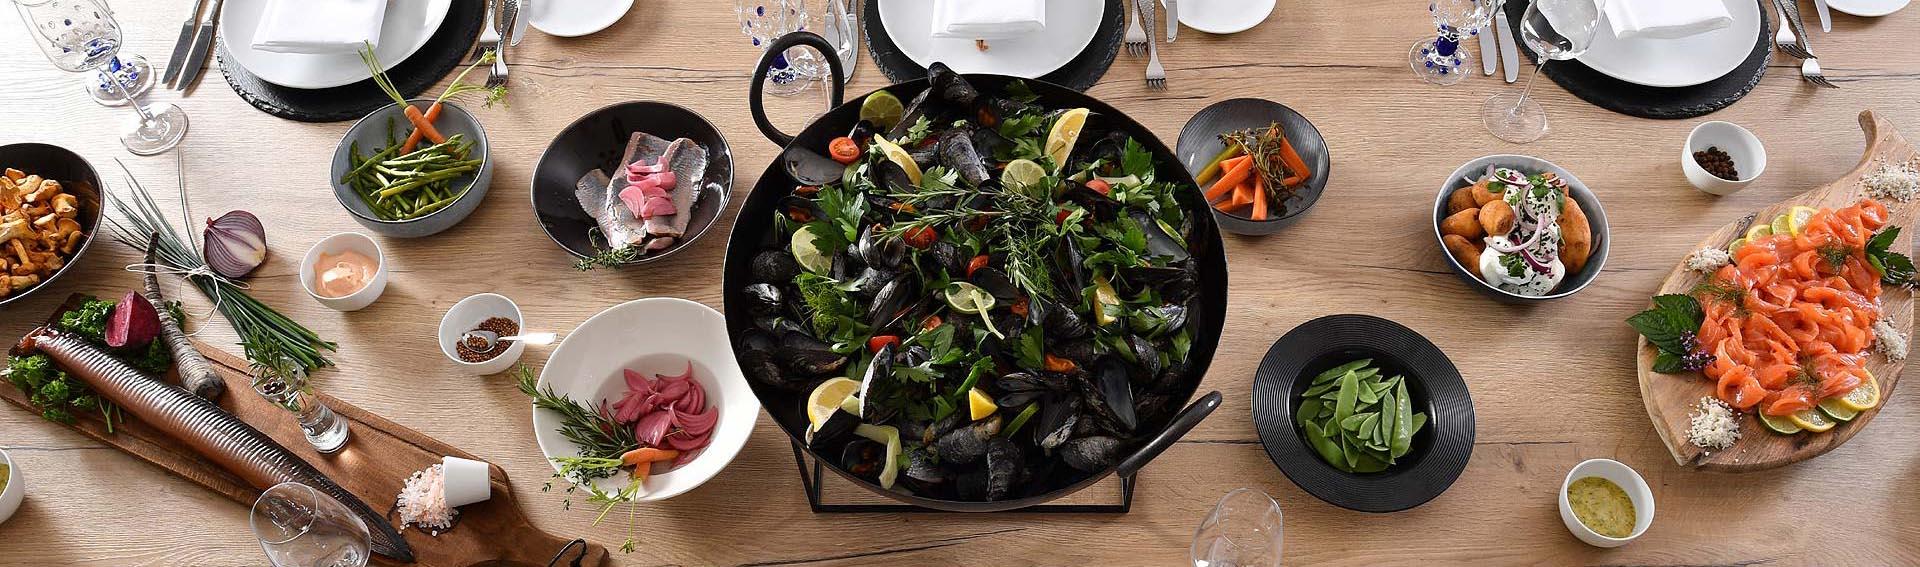 "One of the culinary highlights at Restaurant Kökken - the traditional Sylt fish menu ""Söl Fesk Sinfonii""."